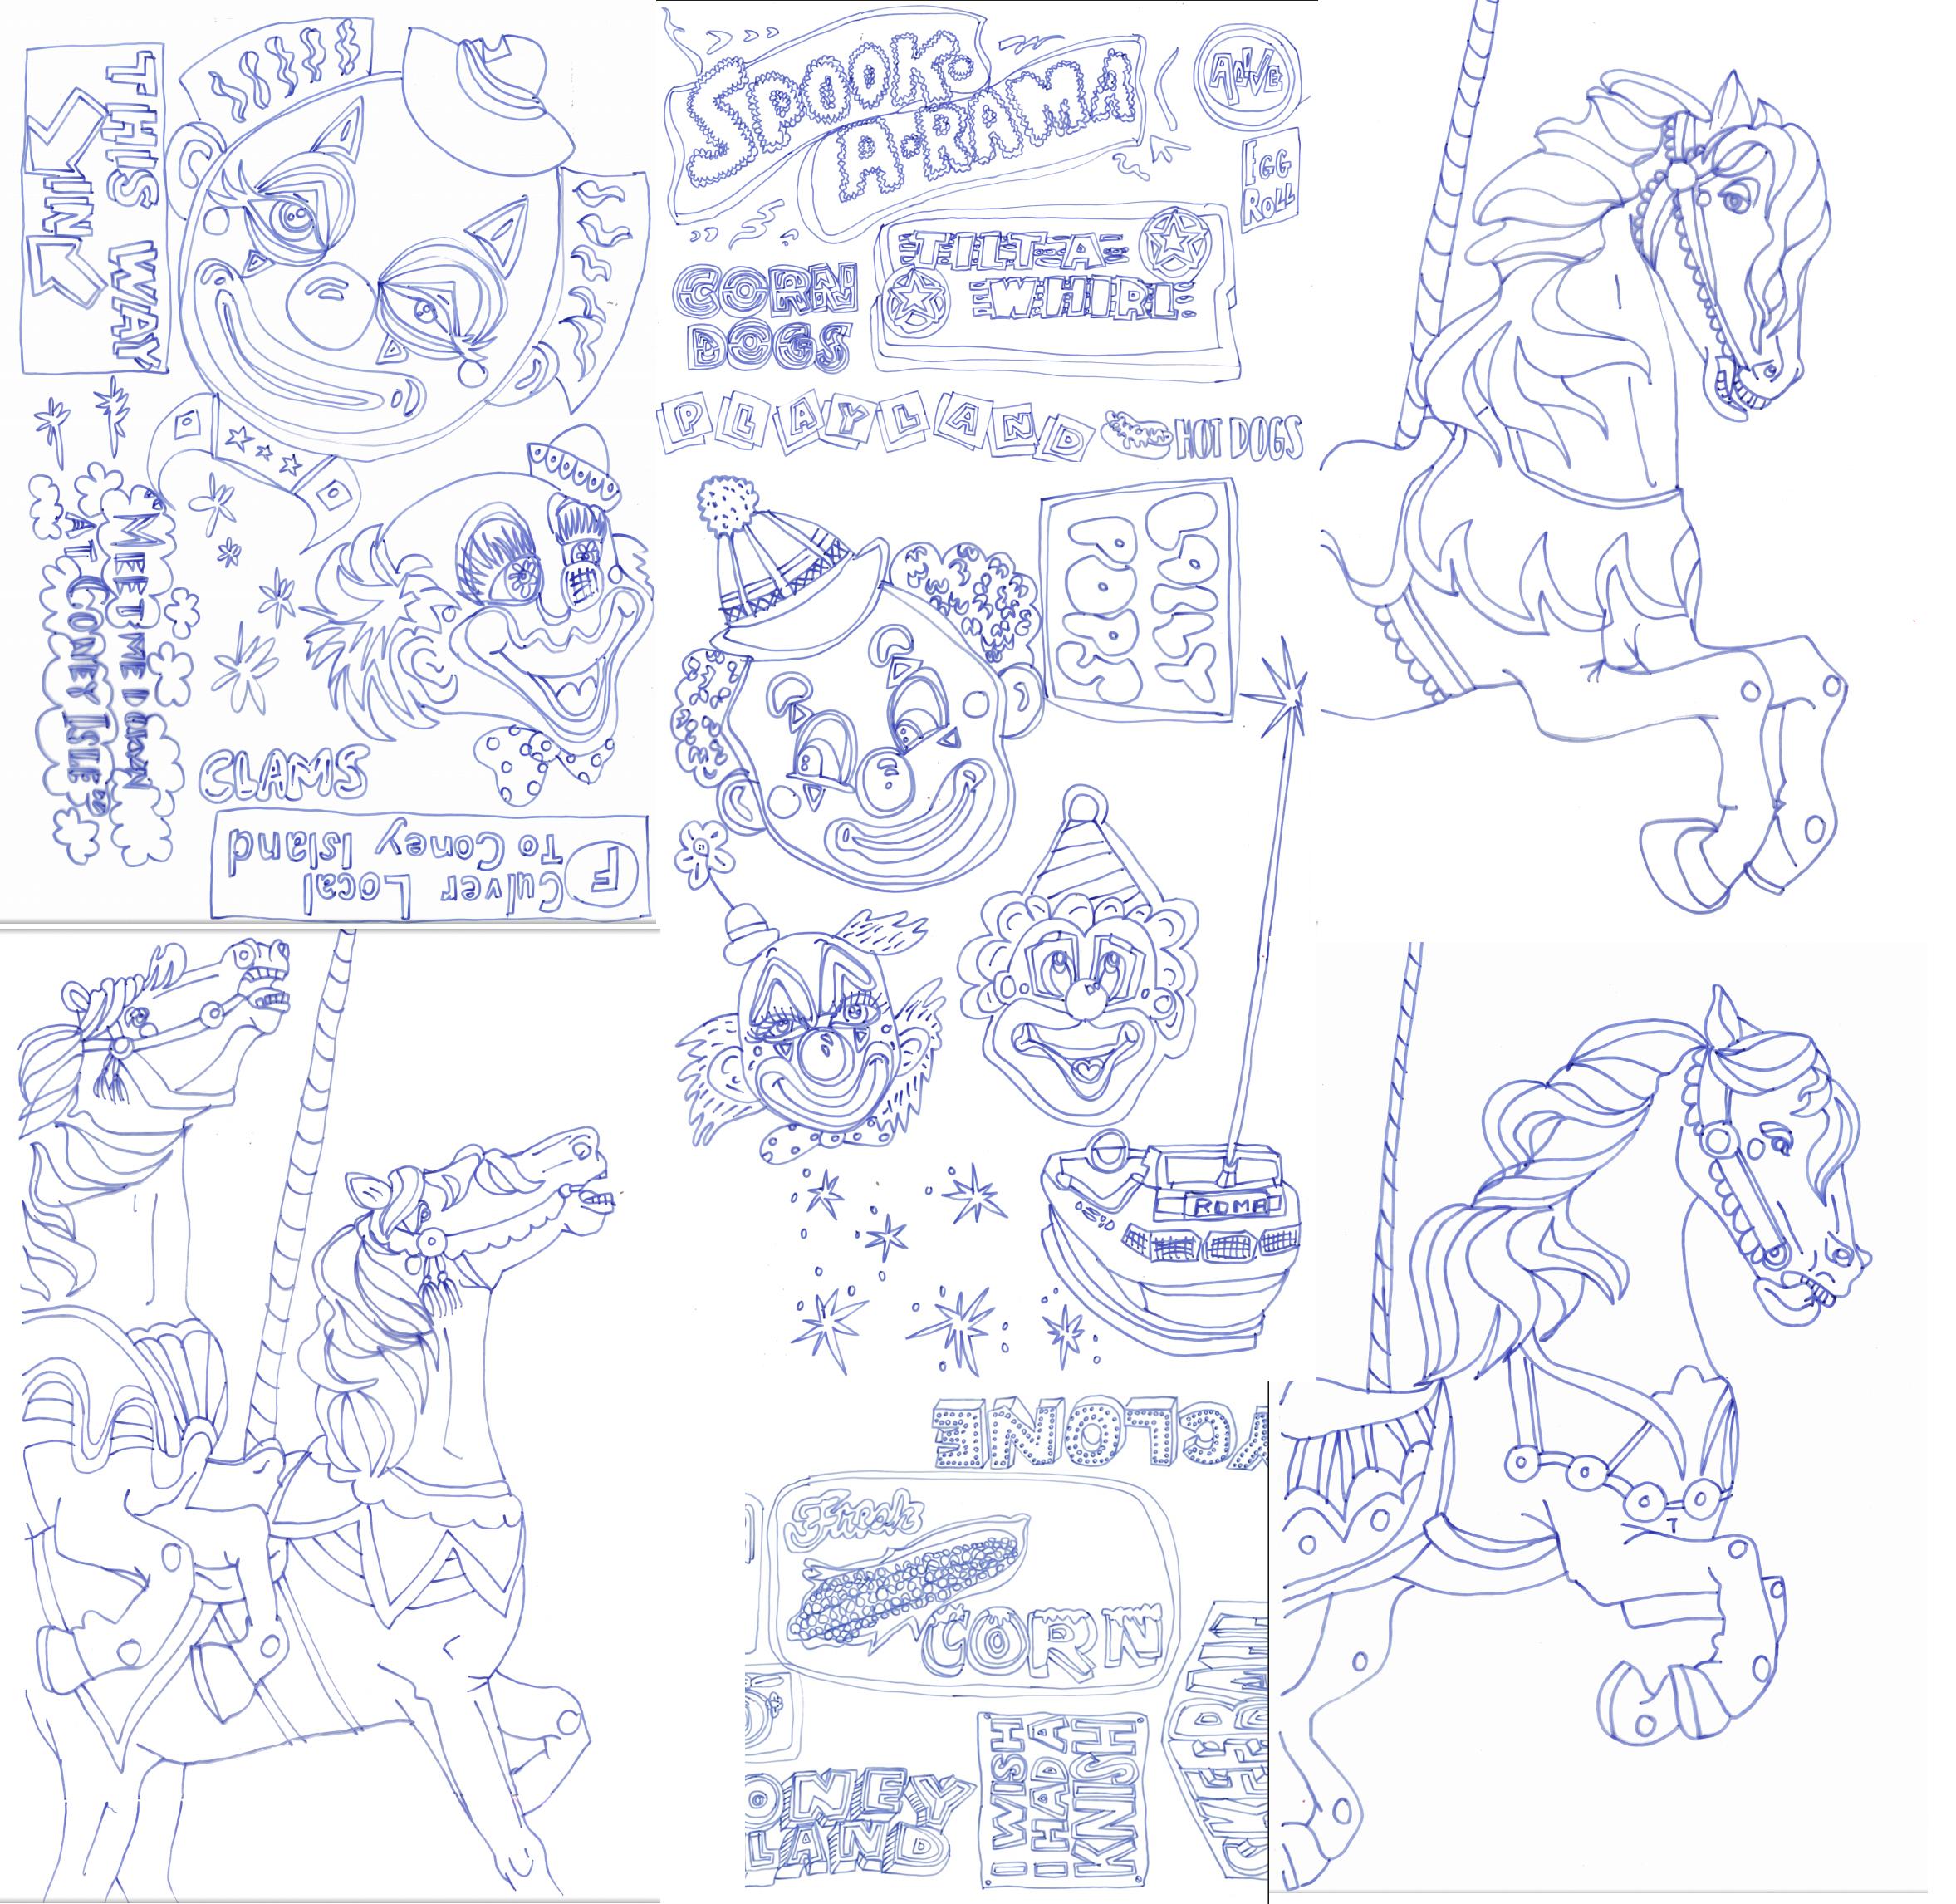 Coney Island tracings for screenprint!